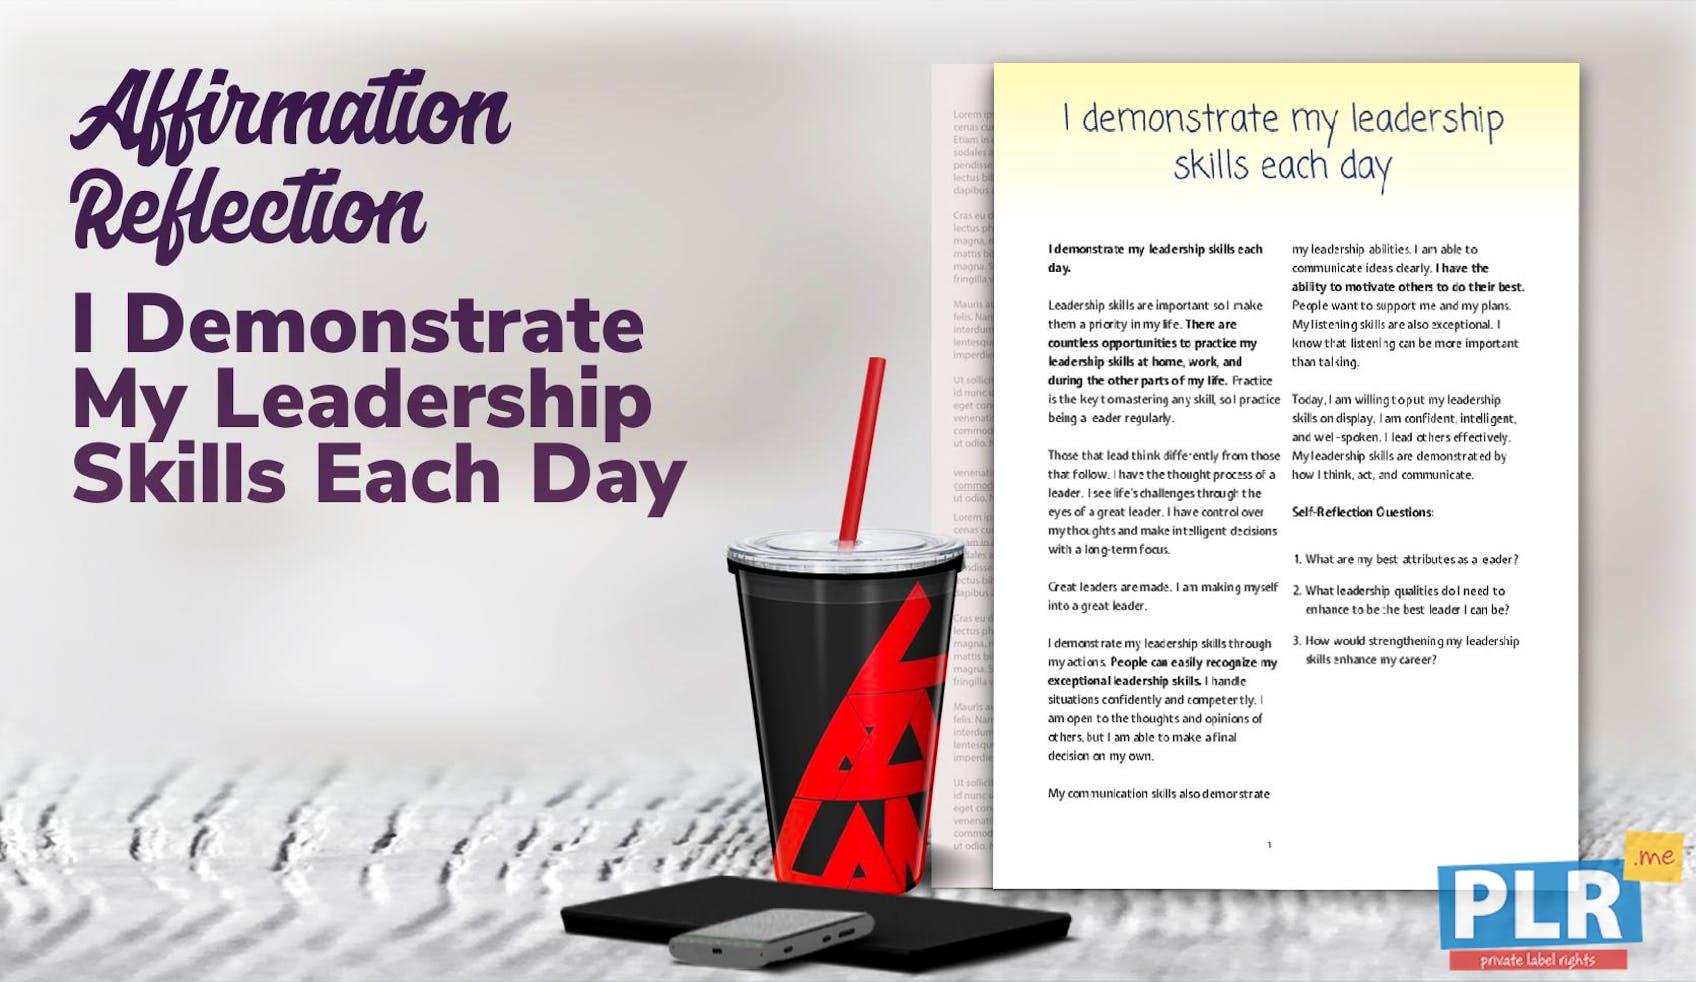 I Demonstrate My Leadership Skills Each Day